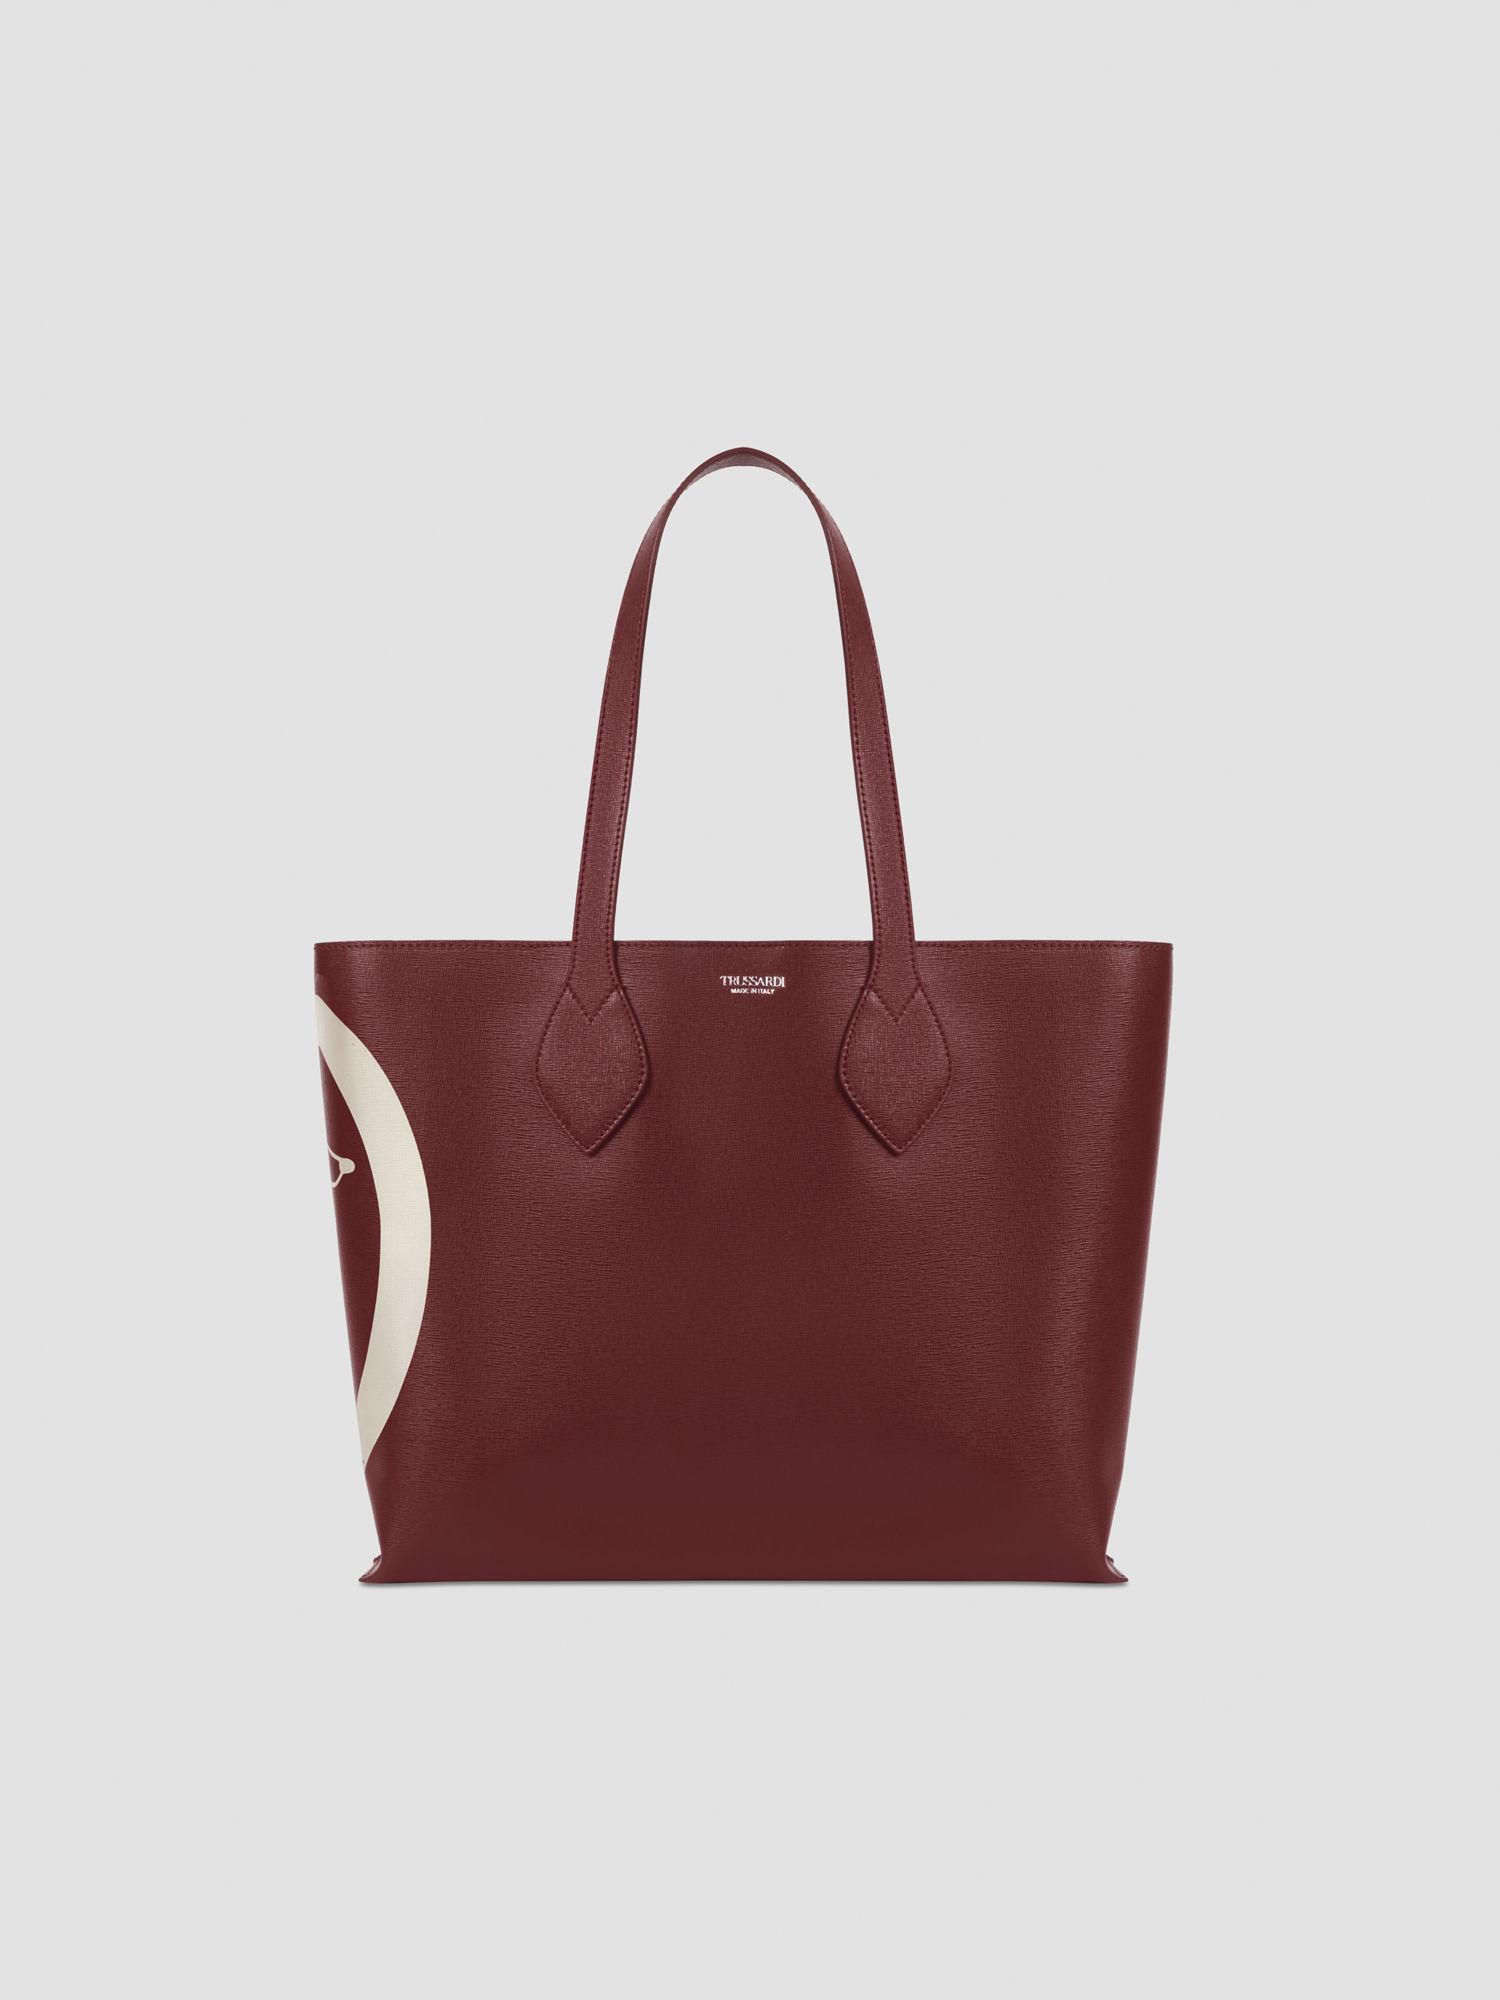 Medium faux saffiano leather shopper TRUSSARDI JEANS 50 01 8051932380908 F